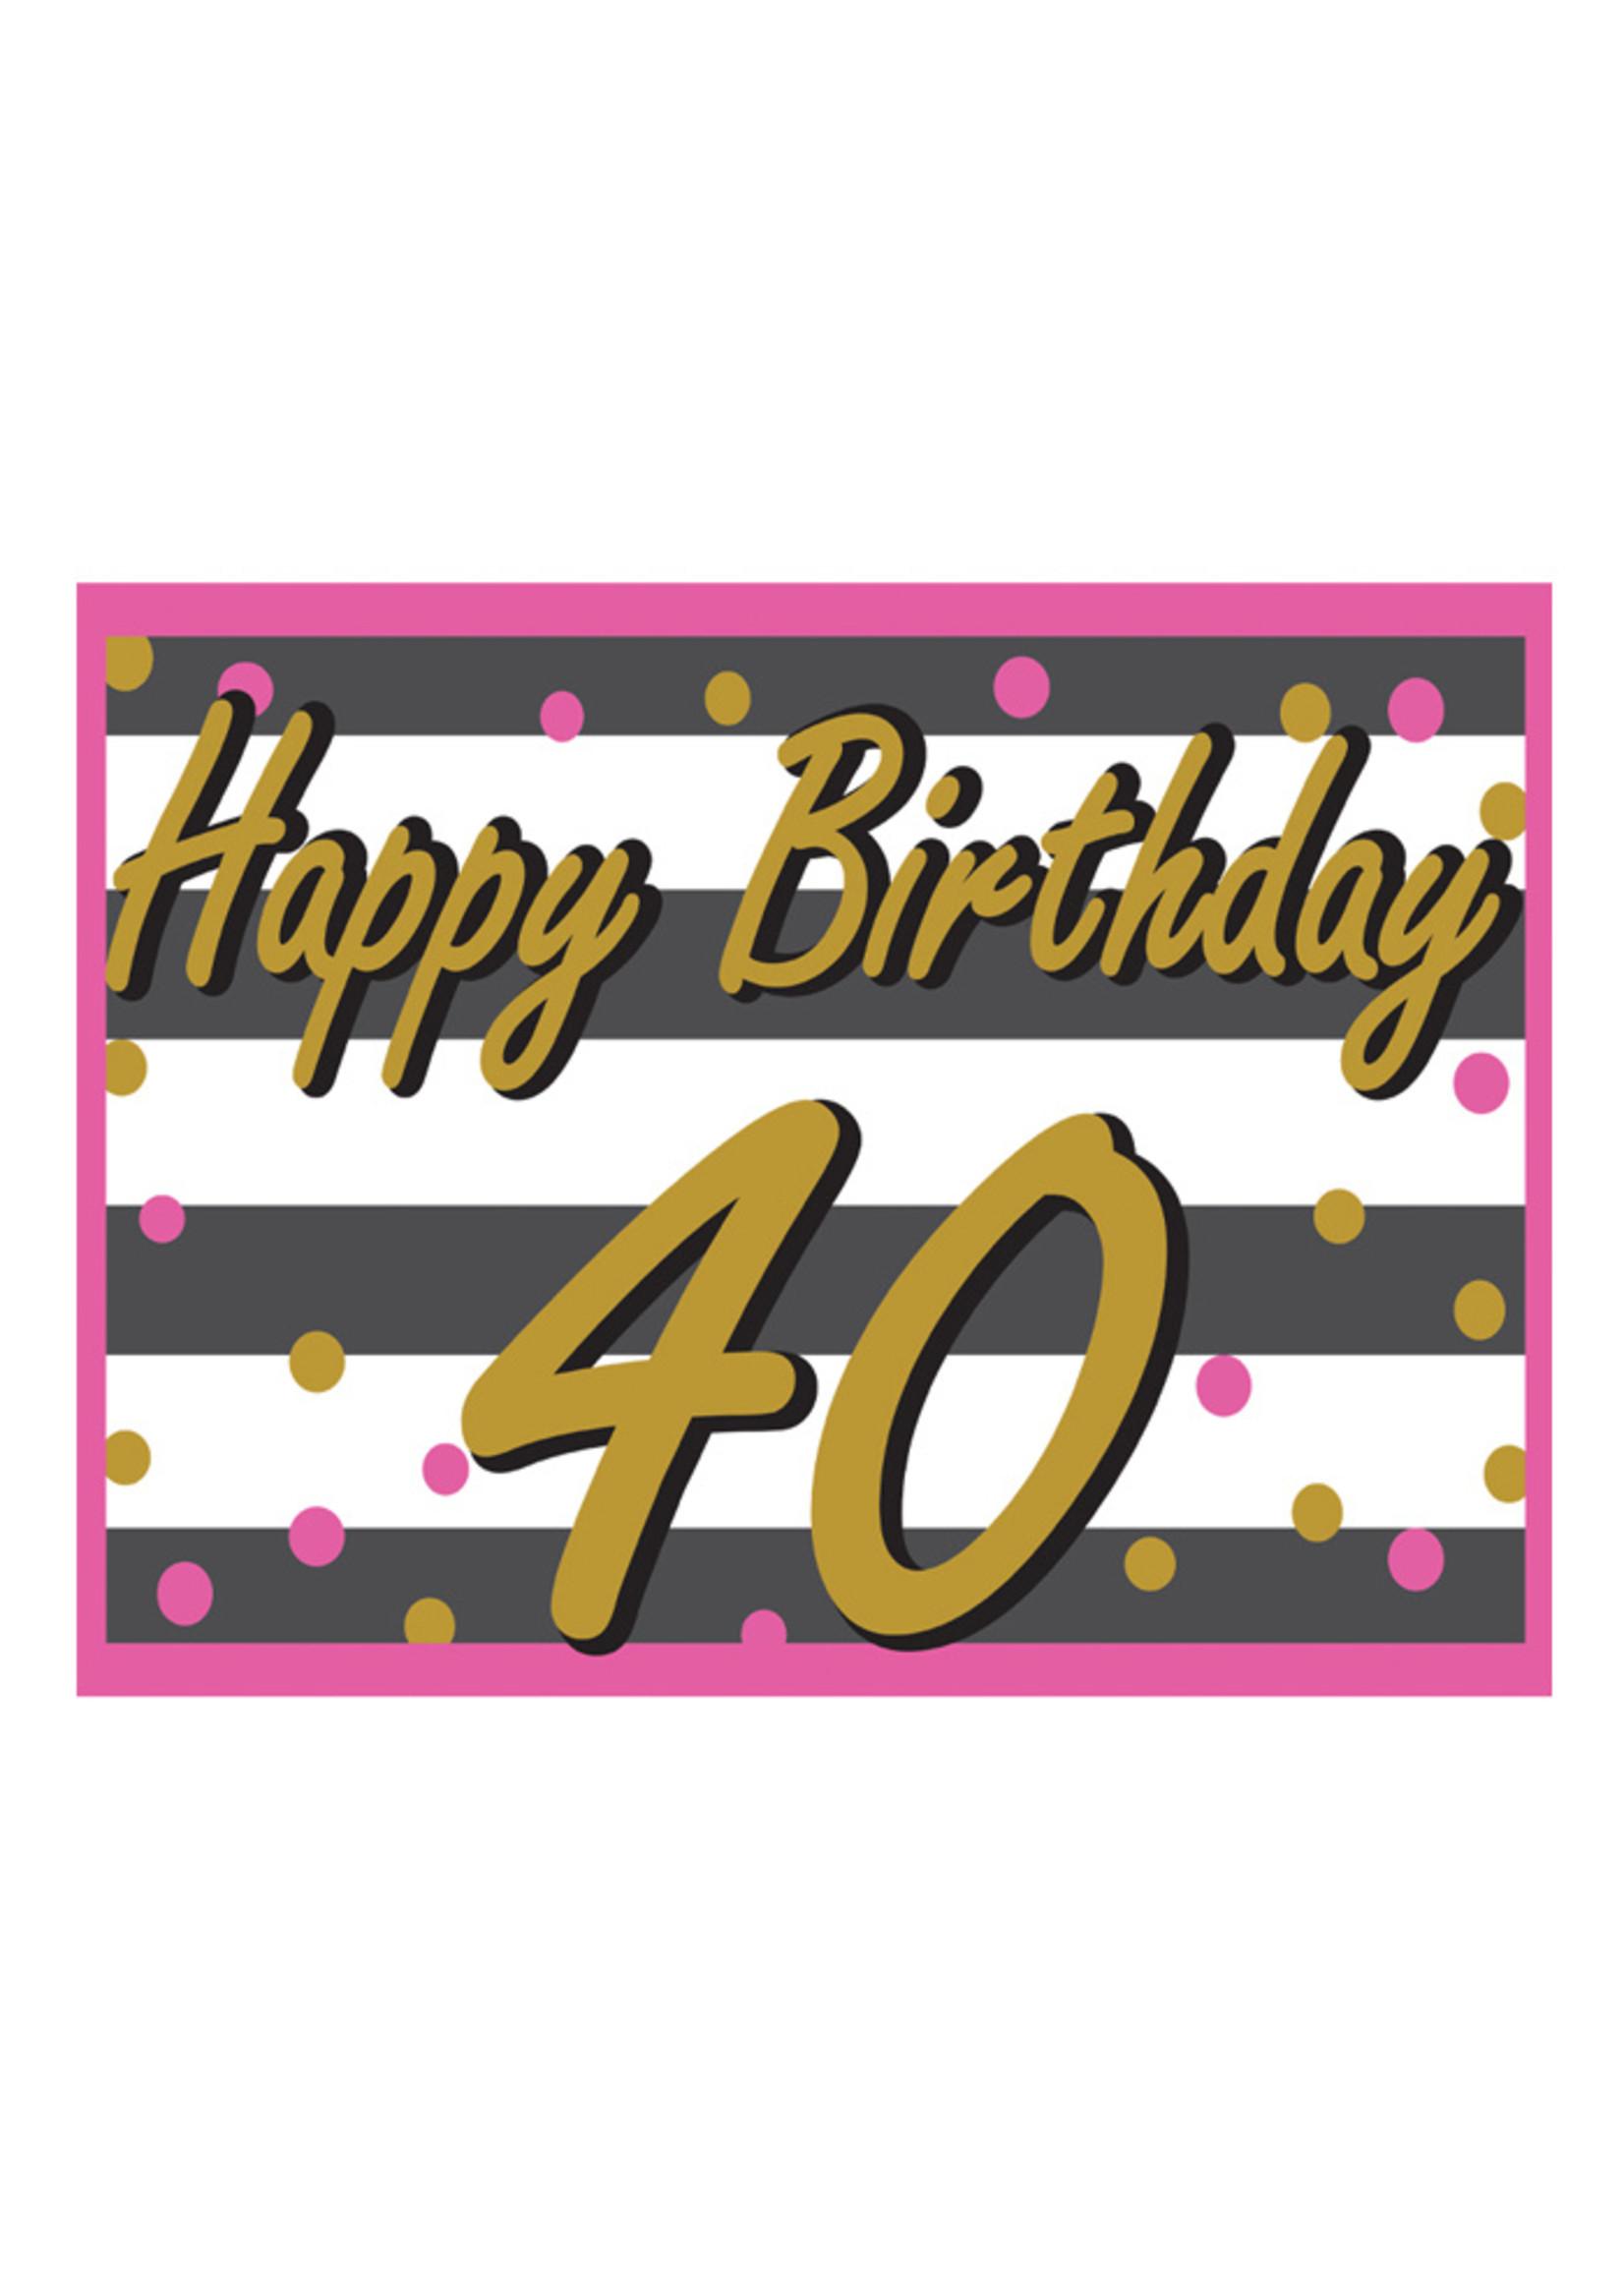 Happy Birthday 40th Pink & Gold Yard Sign